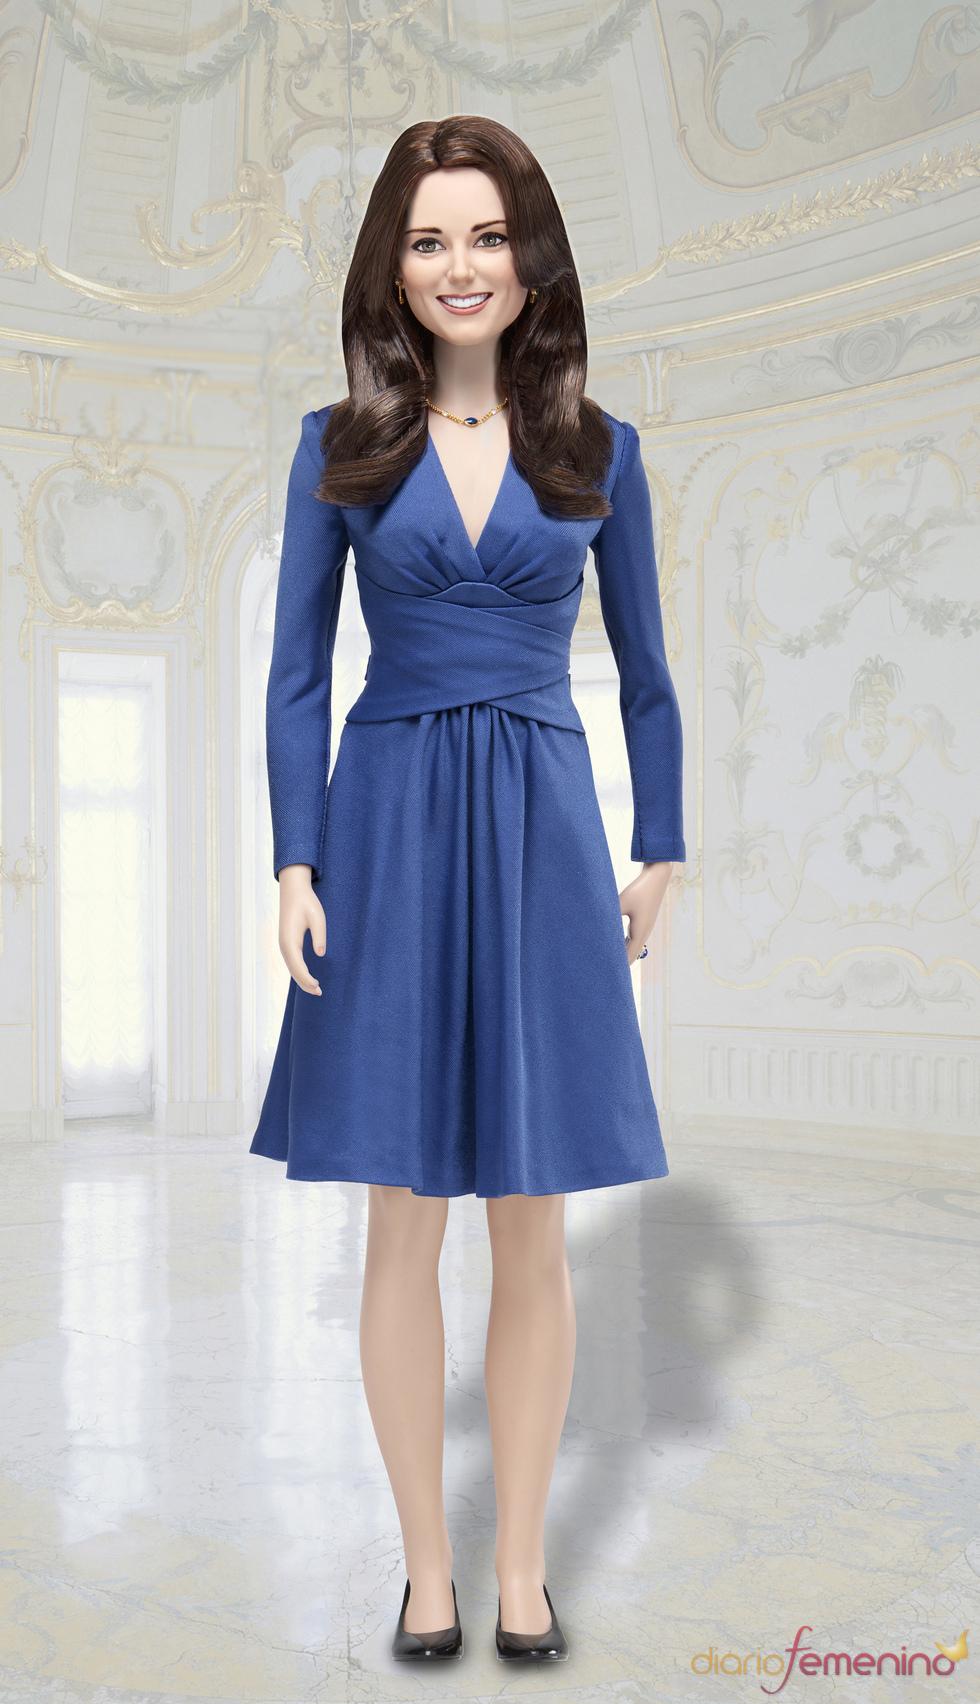 La muñeca Kate Middleton